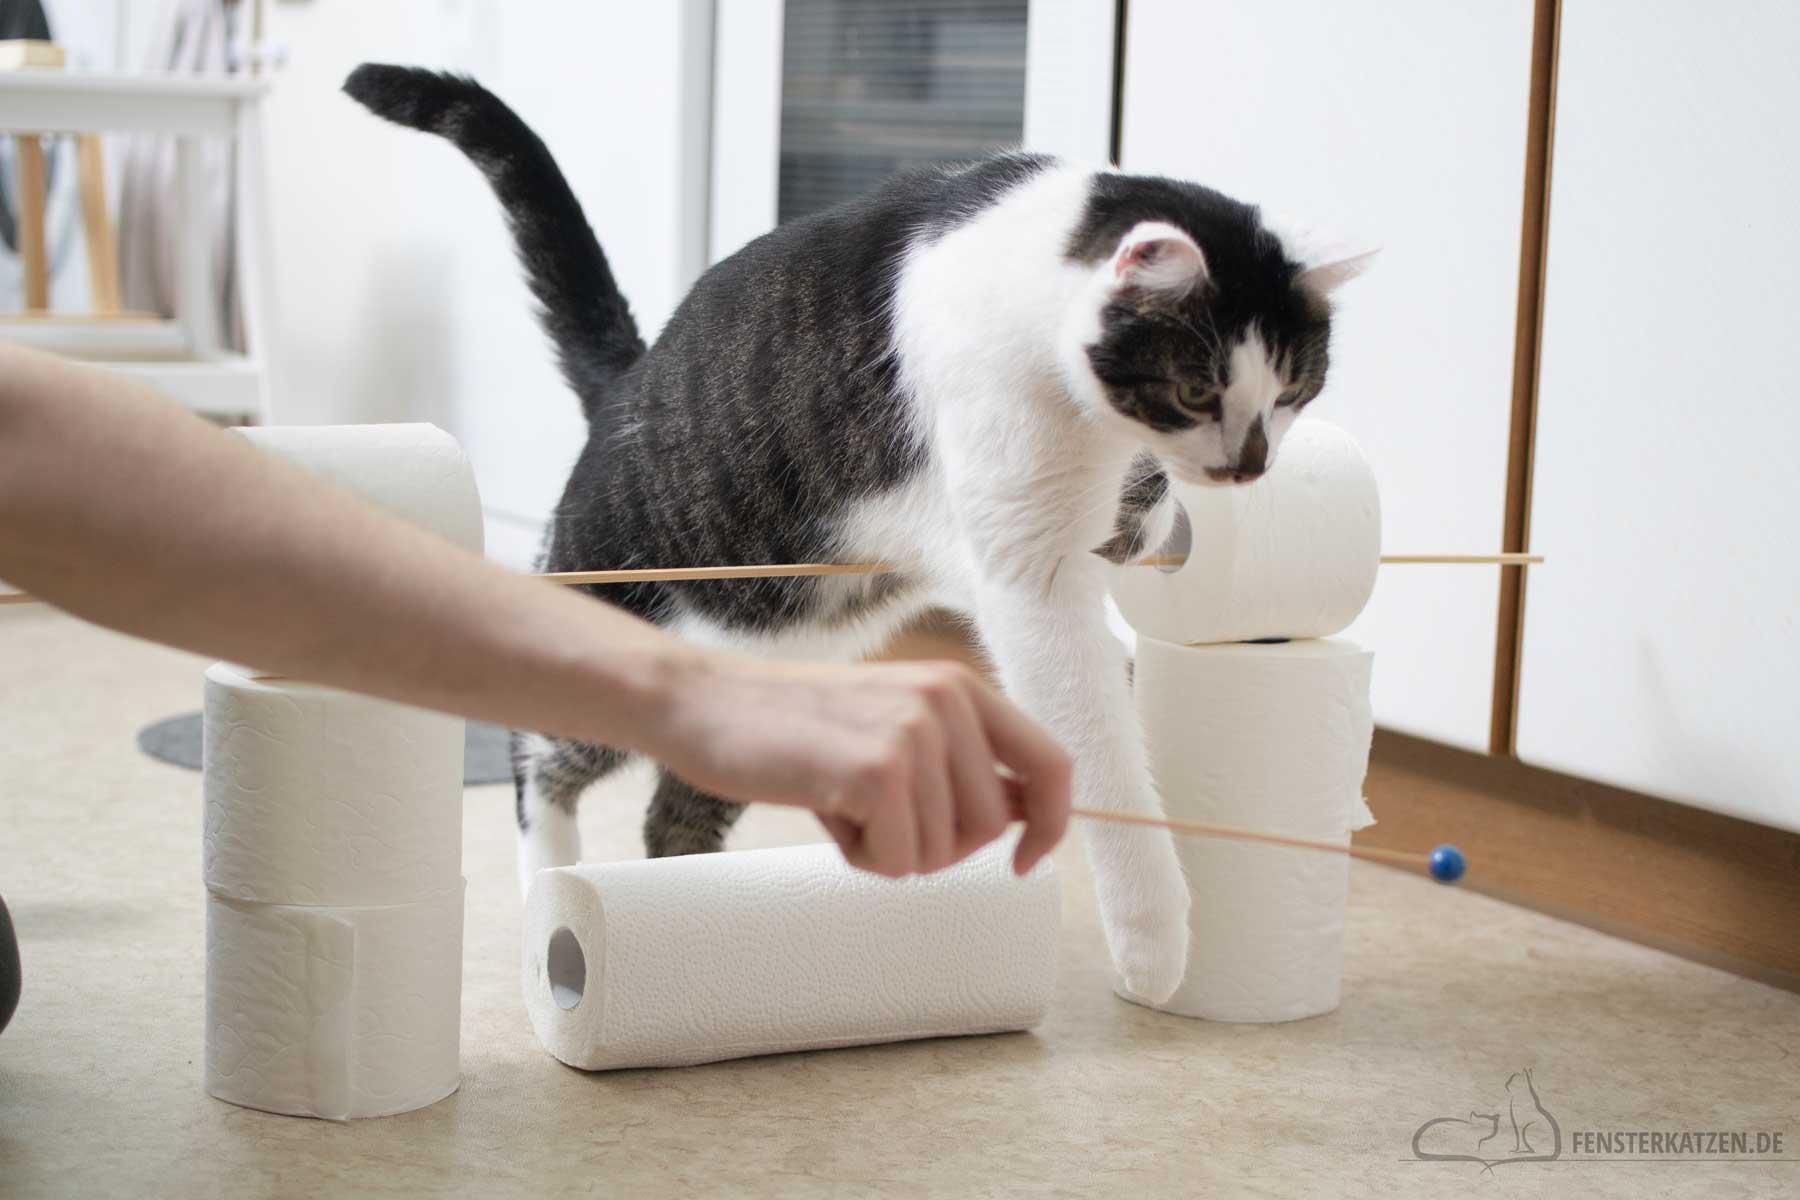 Fensterkatzen-Katzenblog-Cat-Agility-Hindernisparcours-Huerde-Klopapierrollen-hoeher